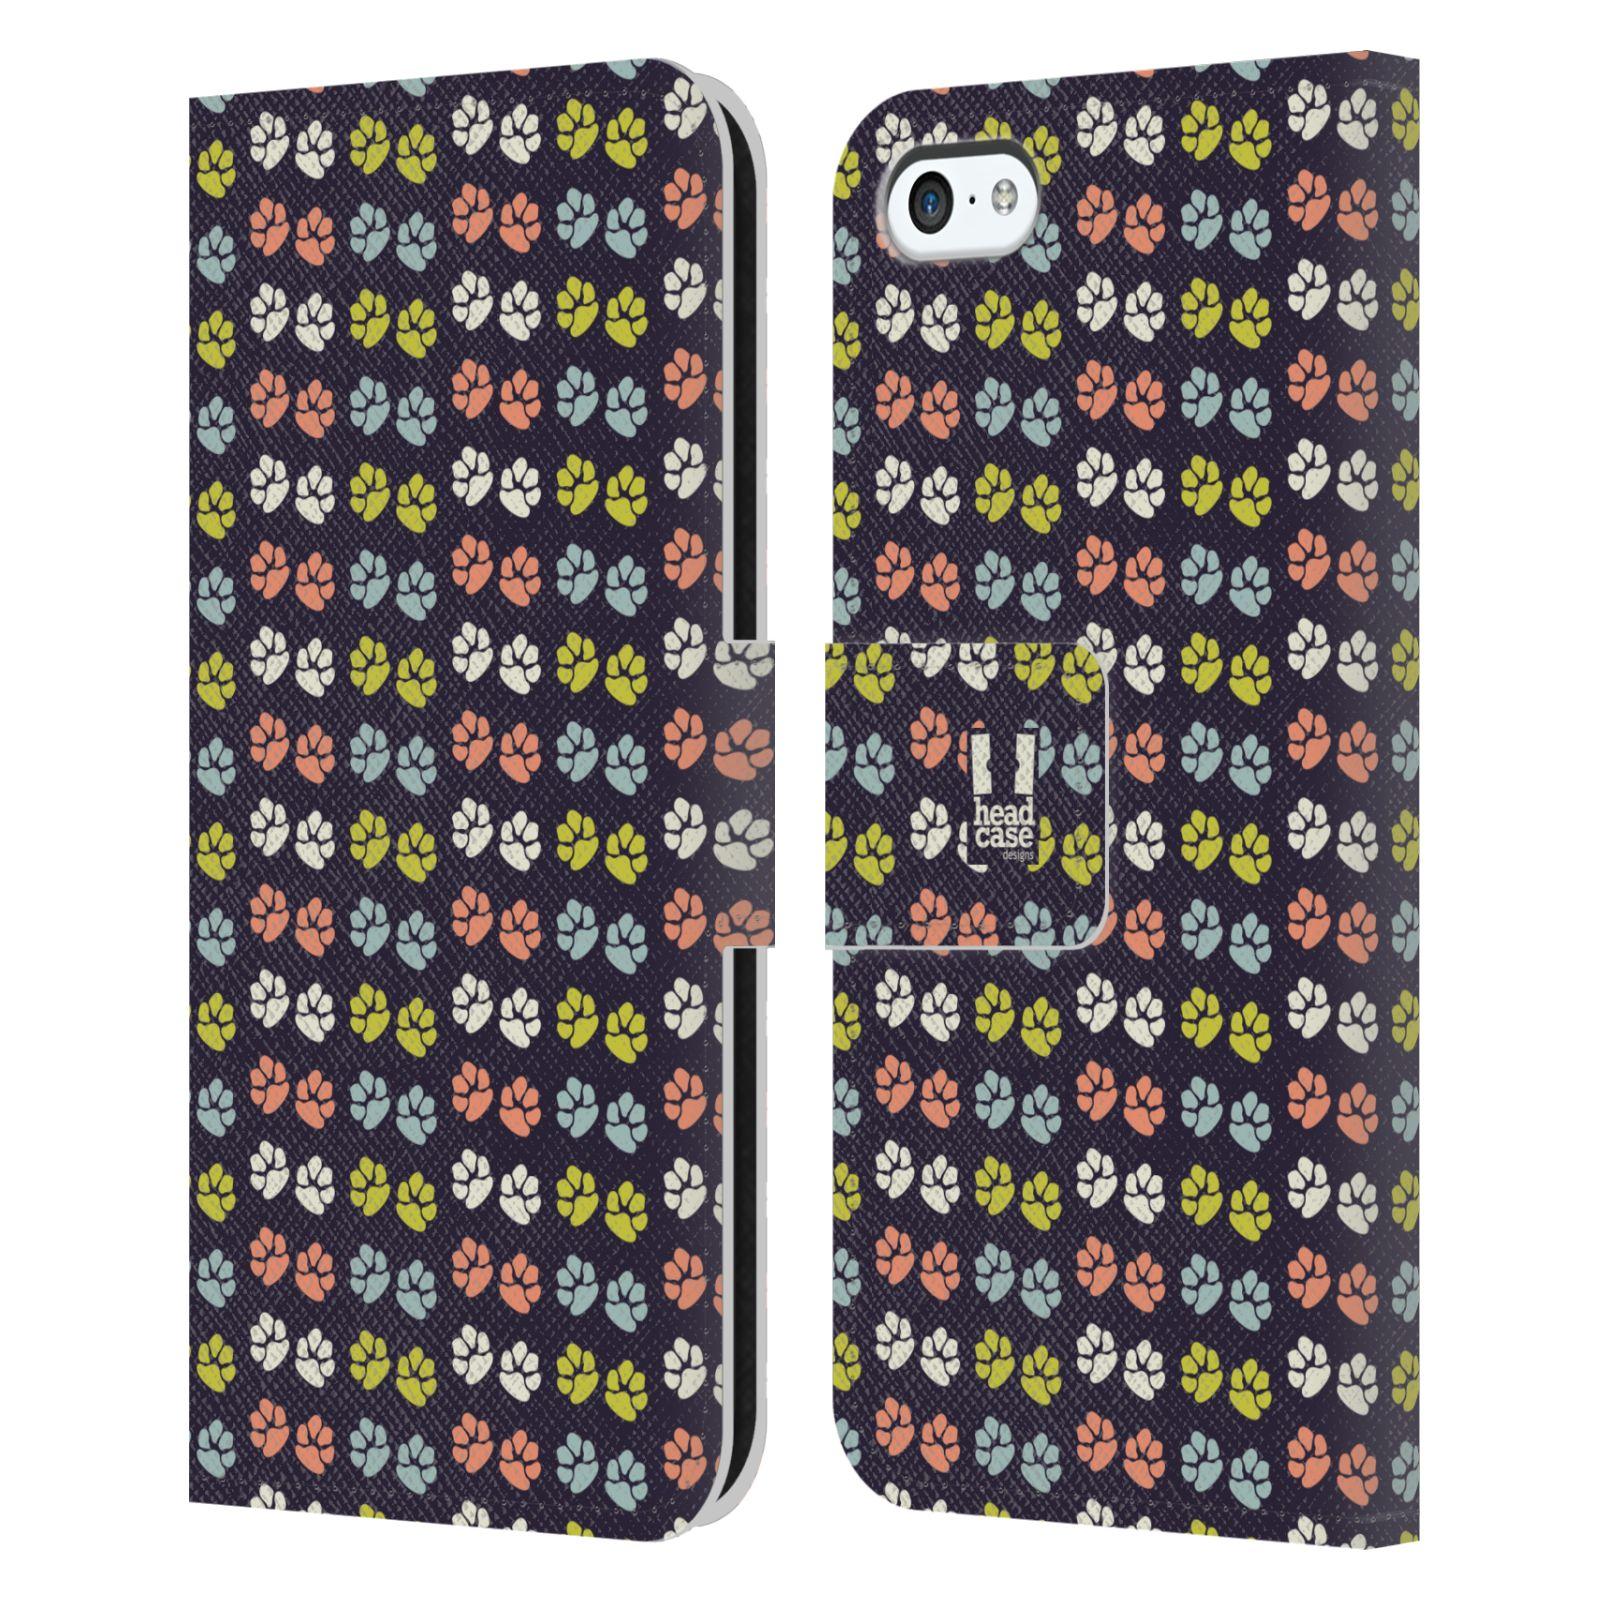 HEAD CASE Flipové pouzdro pro mobil Apple Iphone 5C Pejsek ťapky barevné RETRO